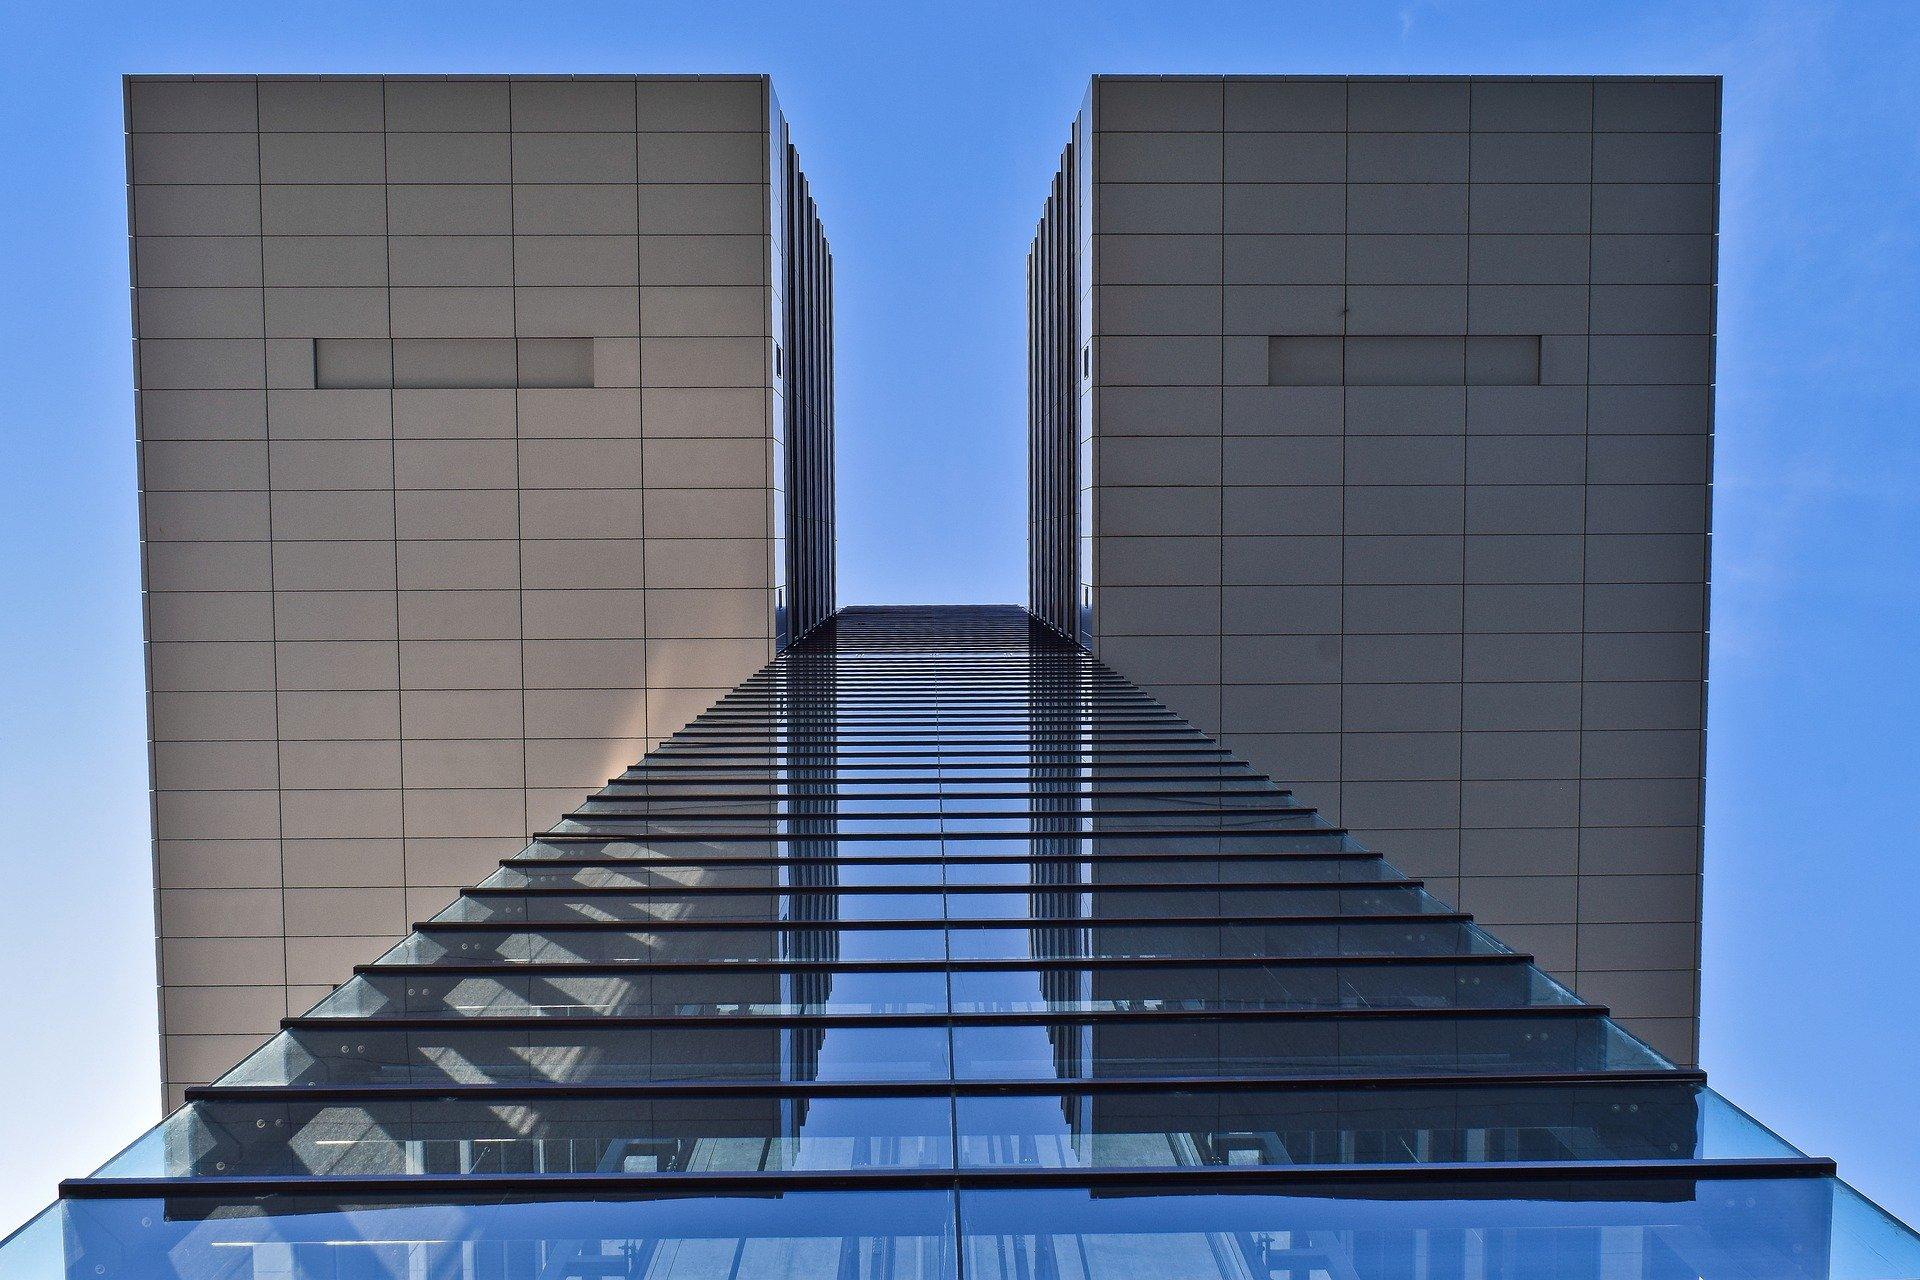 SQL 2008 phase-out enterprise architecture